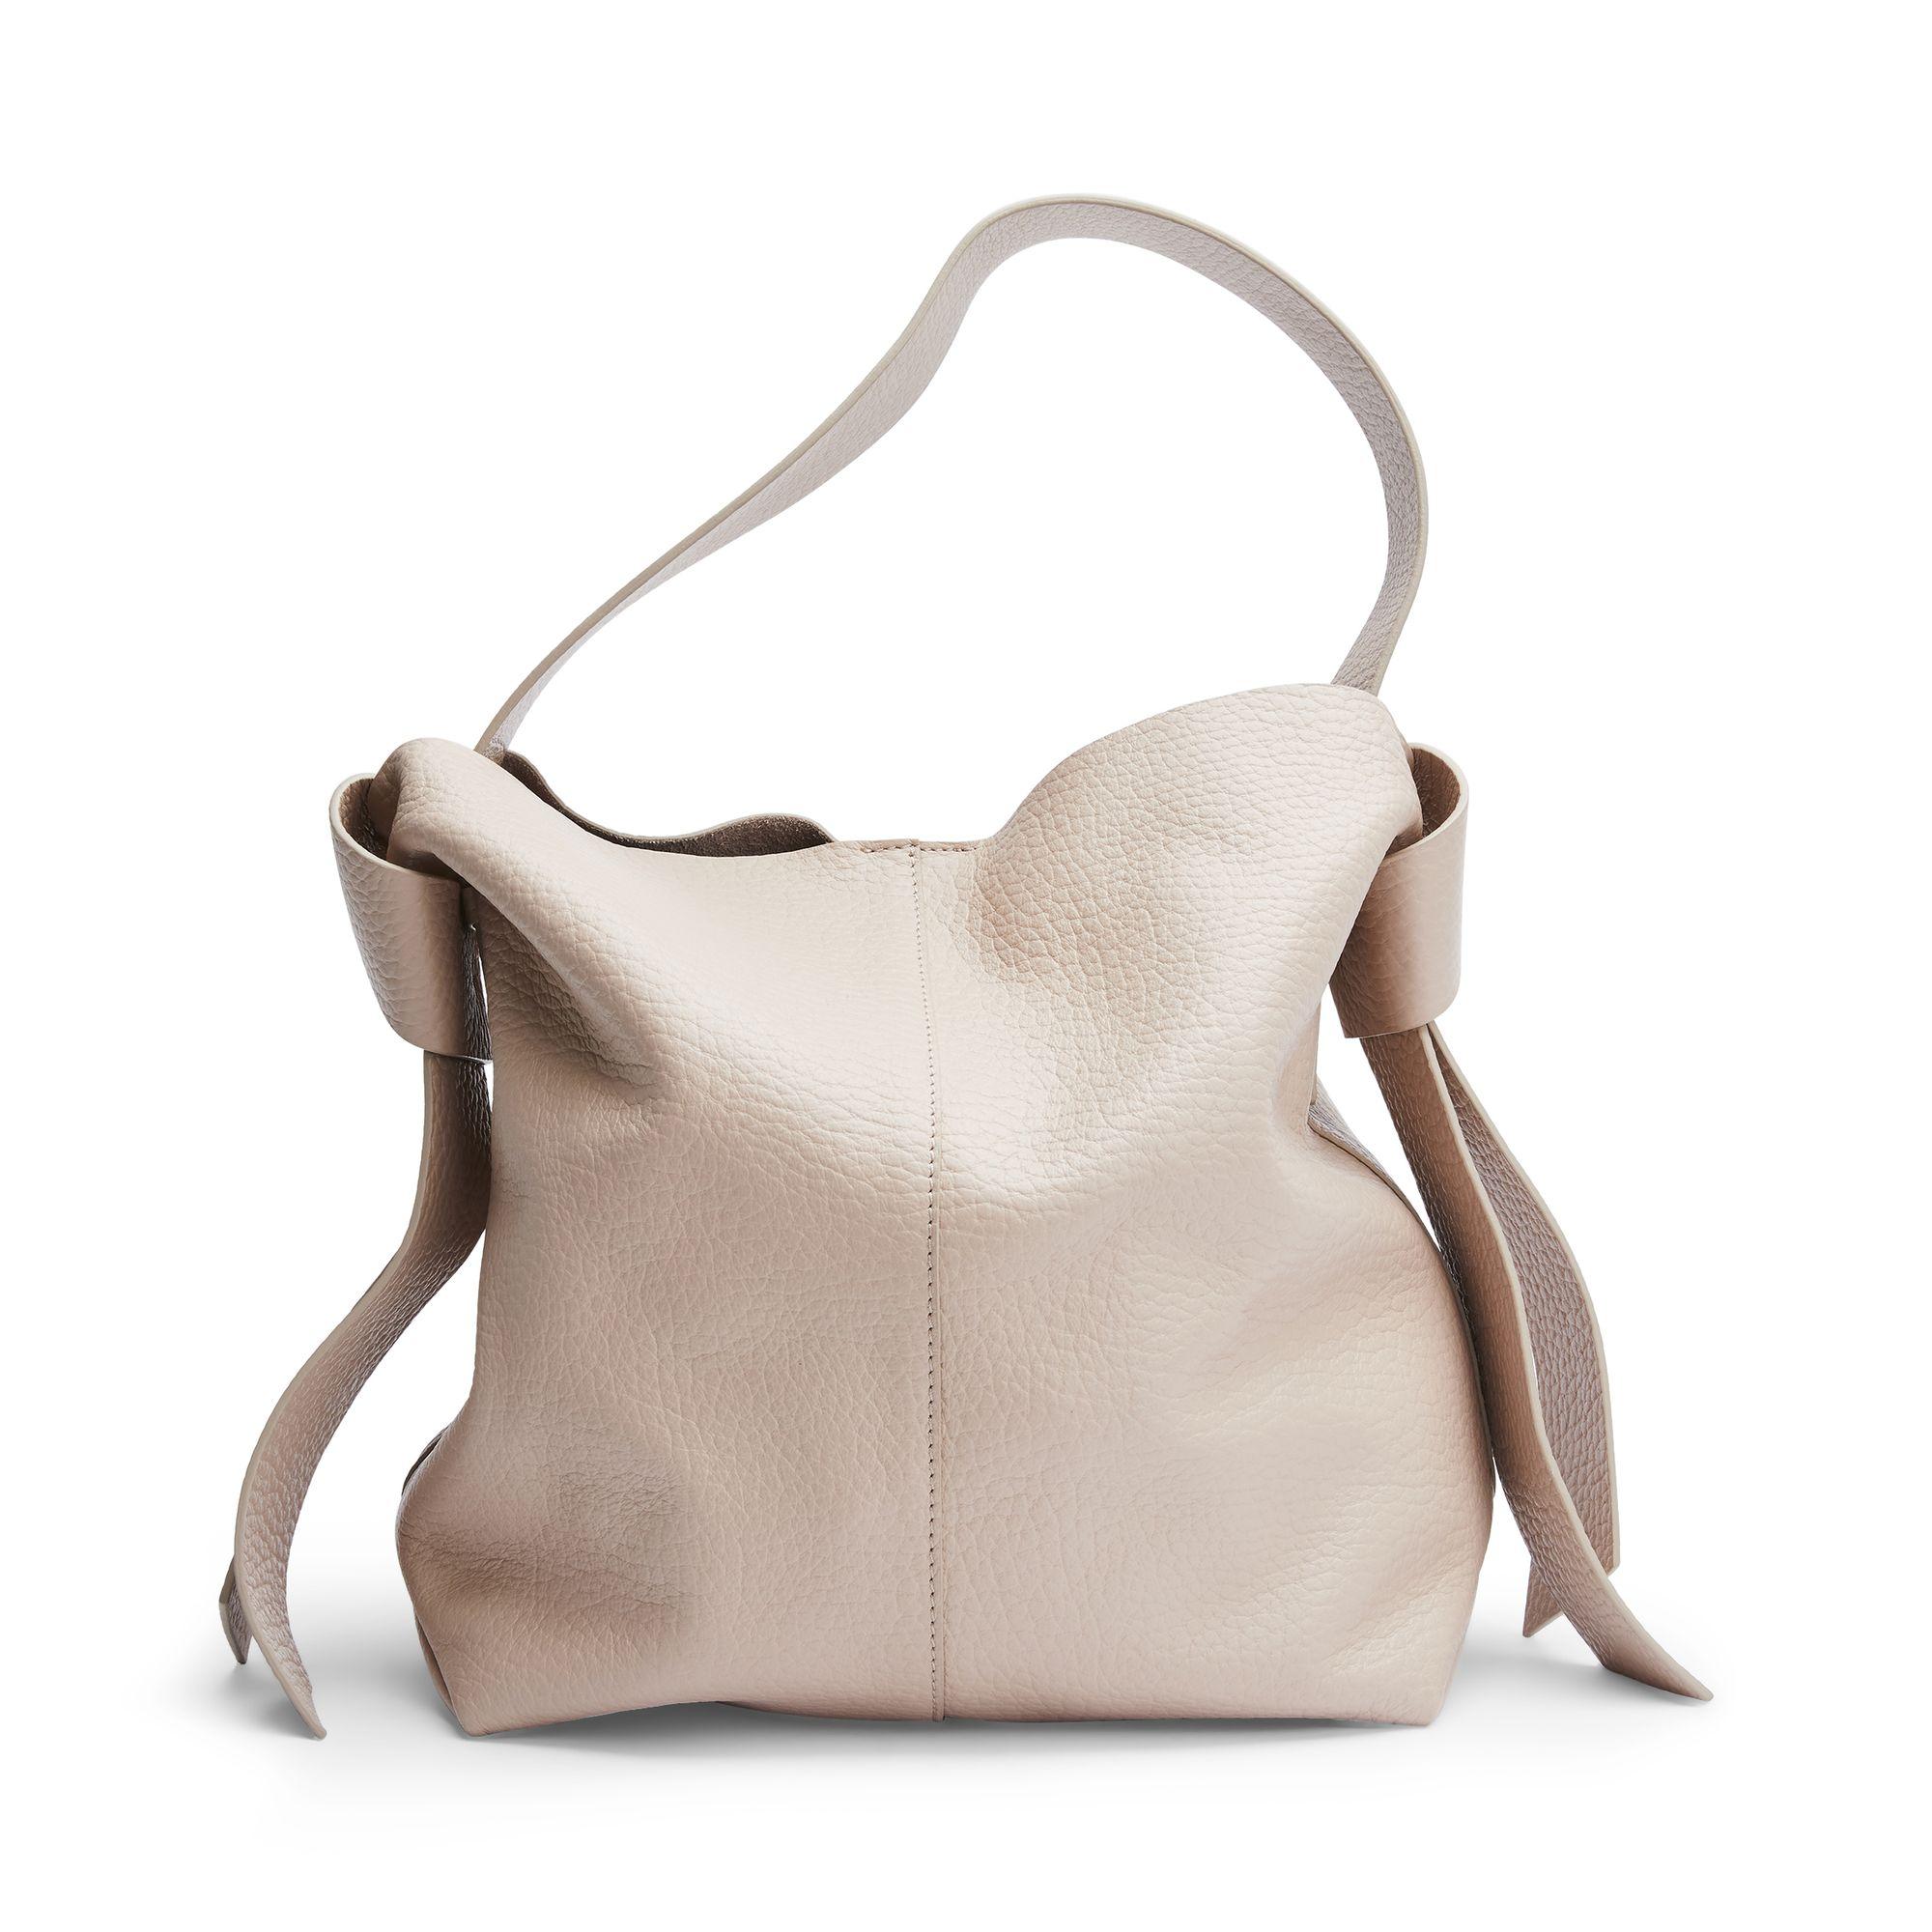 Rizzo Hazel Hobo väska i skinn, Ljusrosa